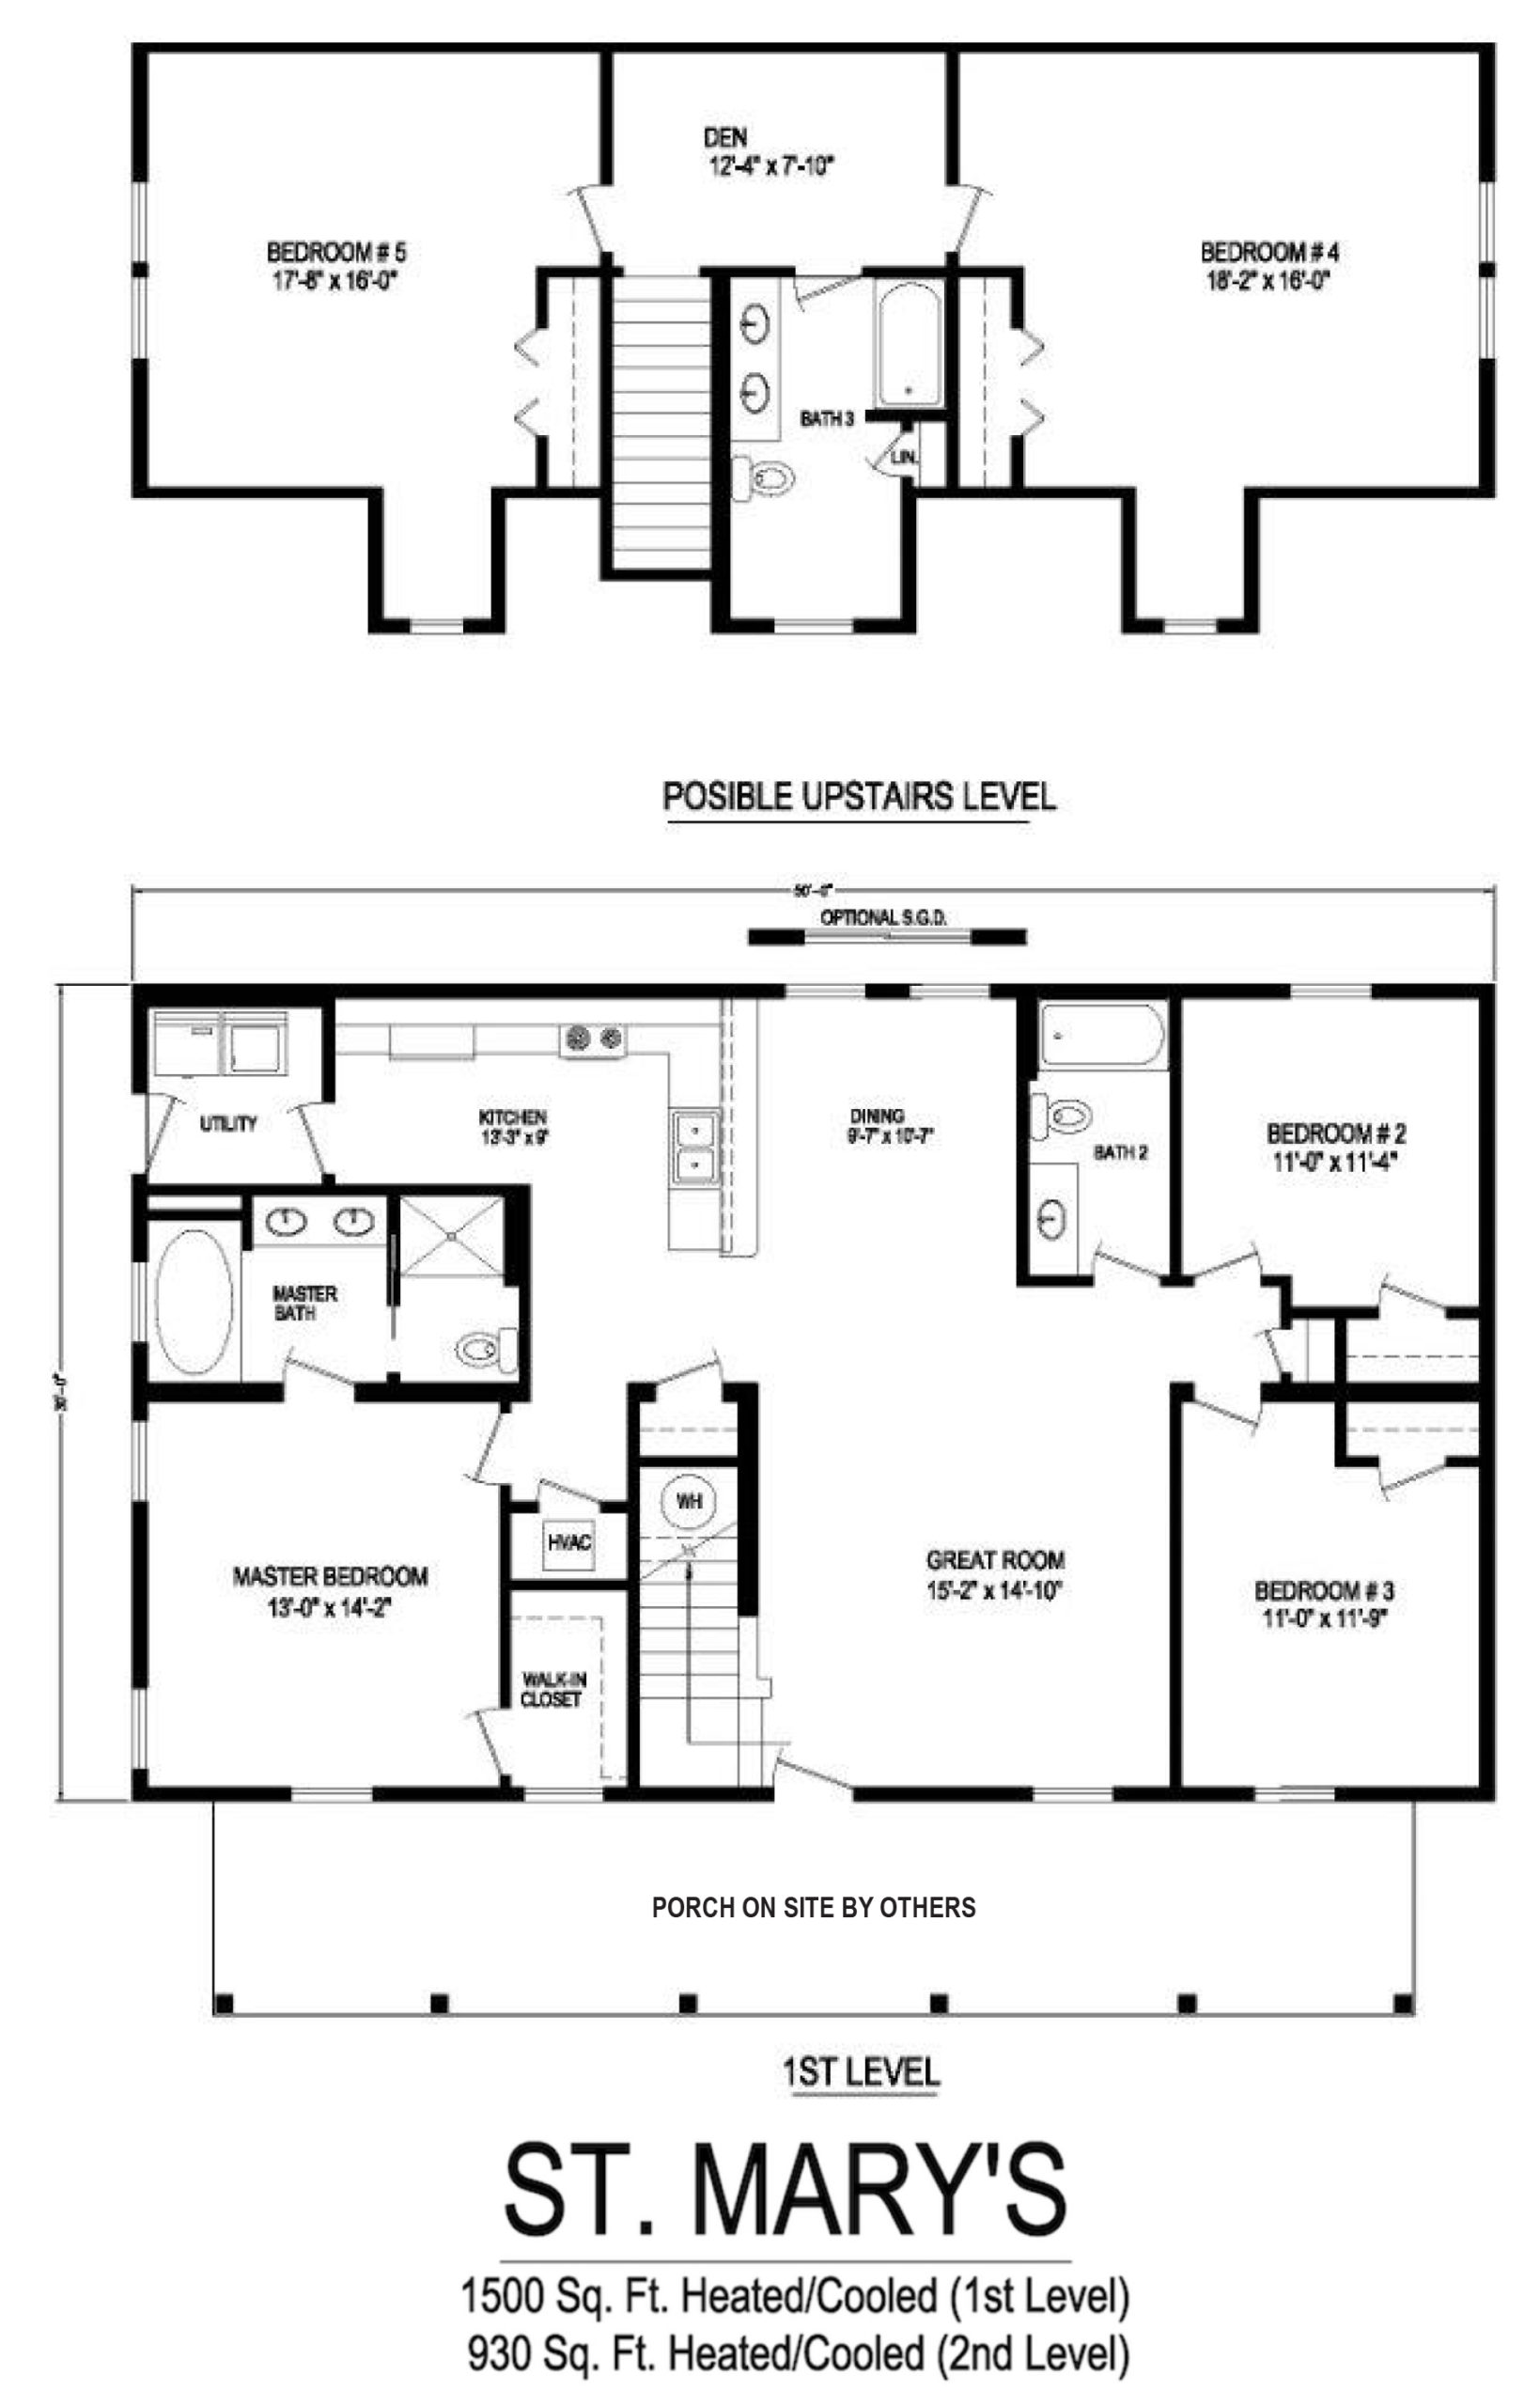 st marys modular home floorplan